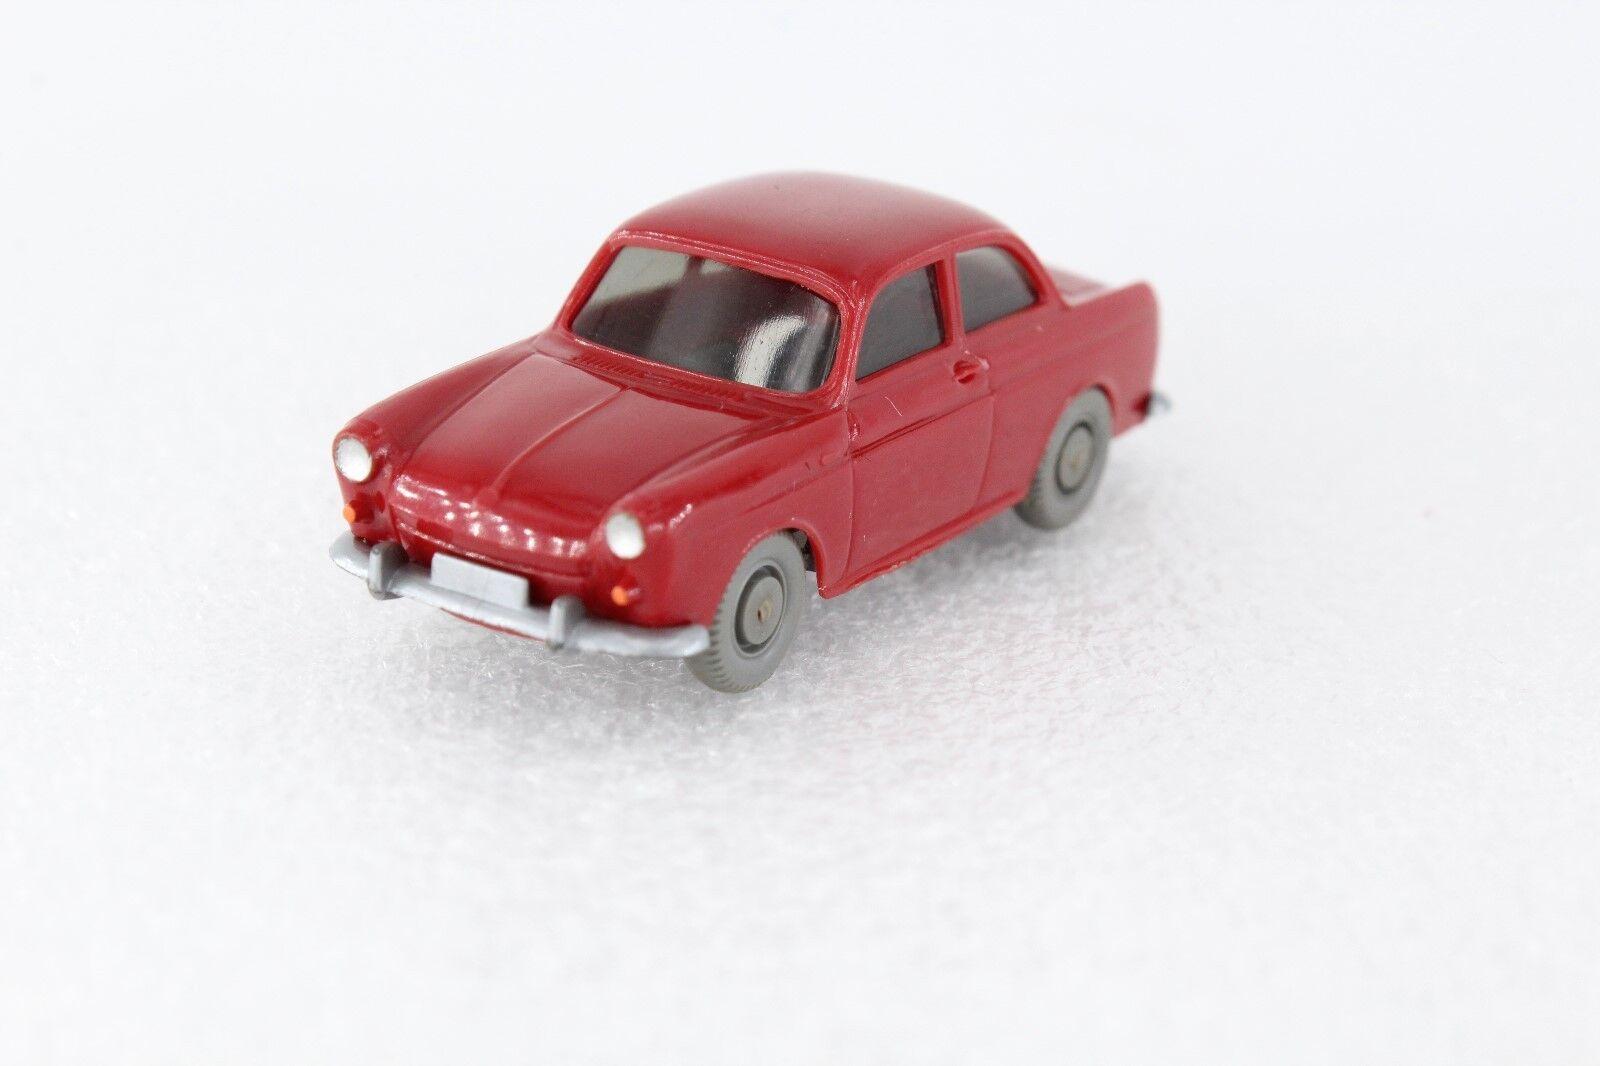 A.S.S WIKING ALTER VW 1500 1600 STUFE RUBINROT 1963 GK 40 12A CS 307 1A 1WTOP  | Mittlere Kosten